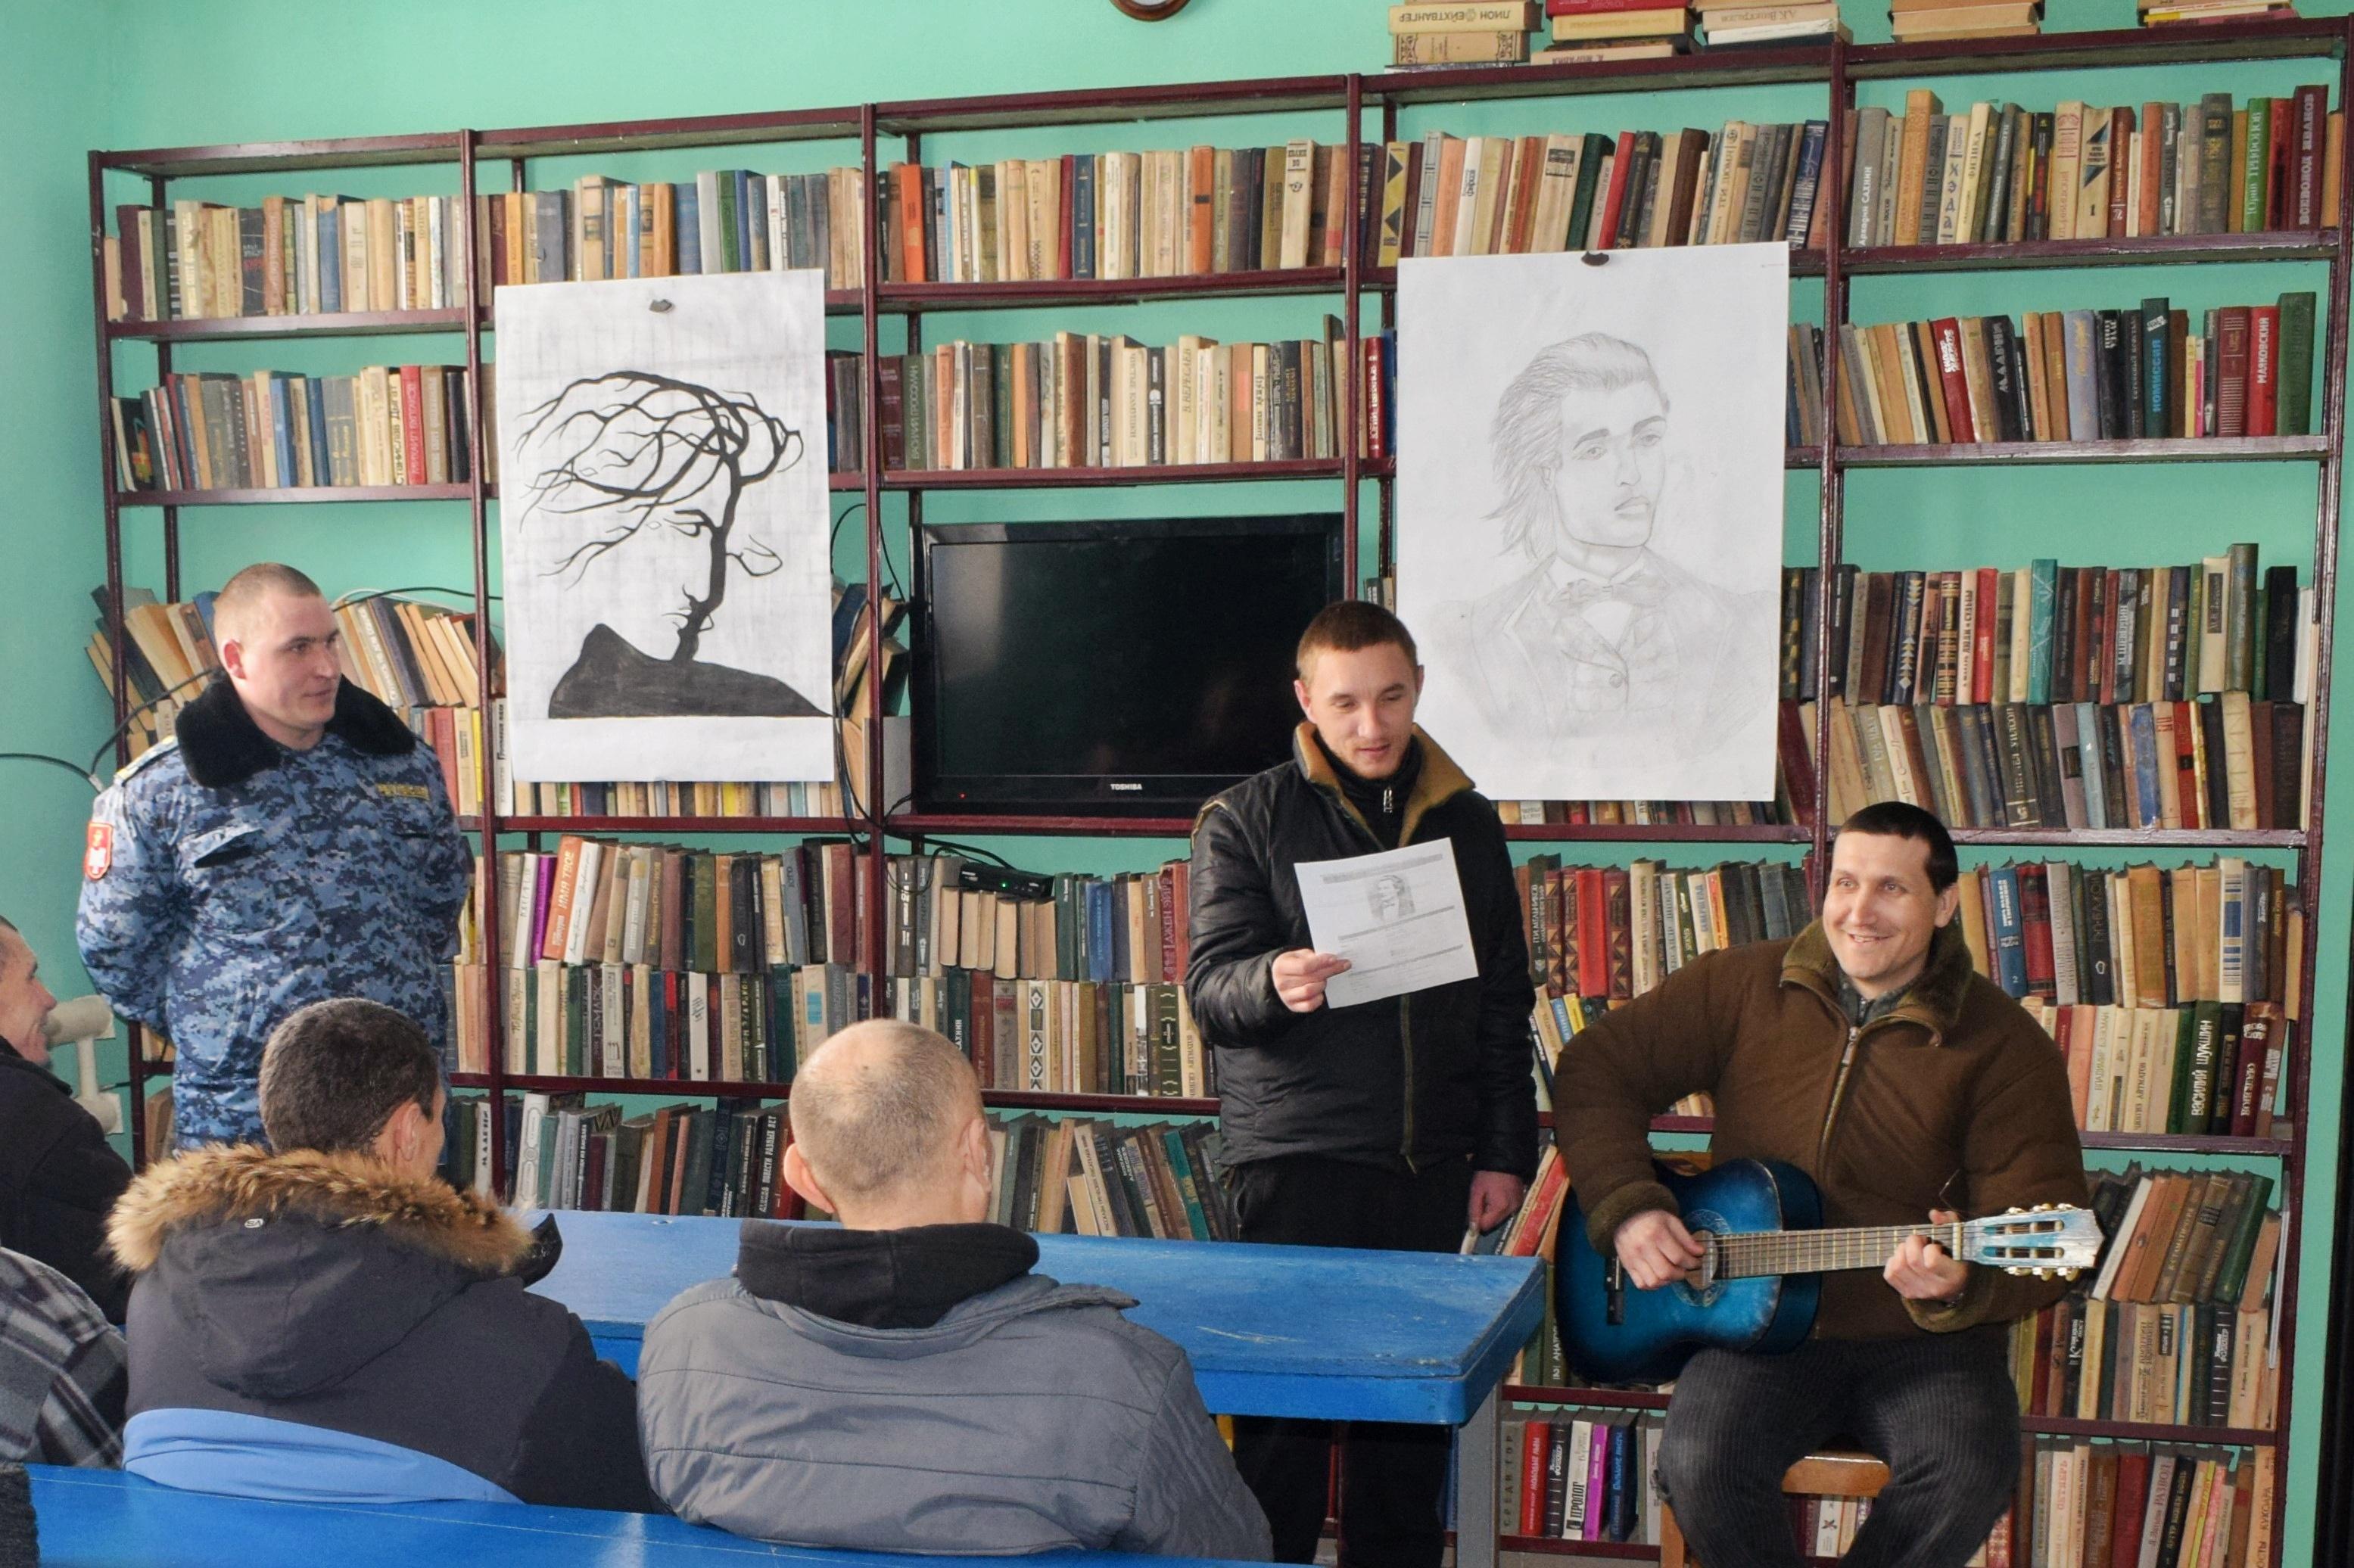 penitenciare moldova, ziua lui eminescu, comemorare eminescu